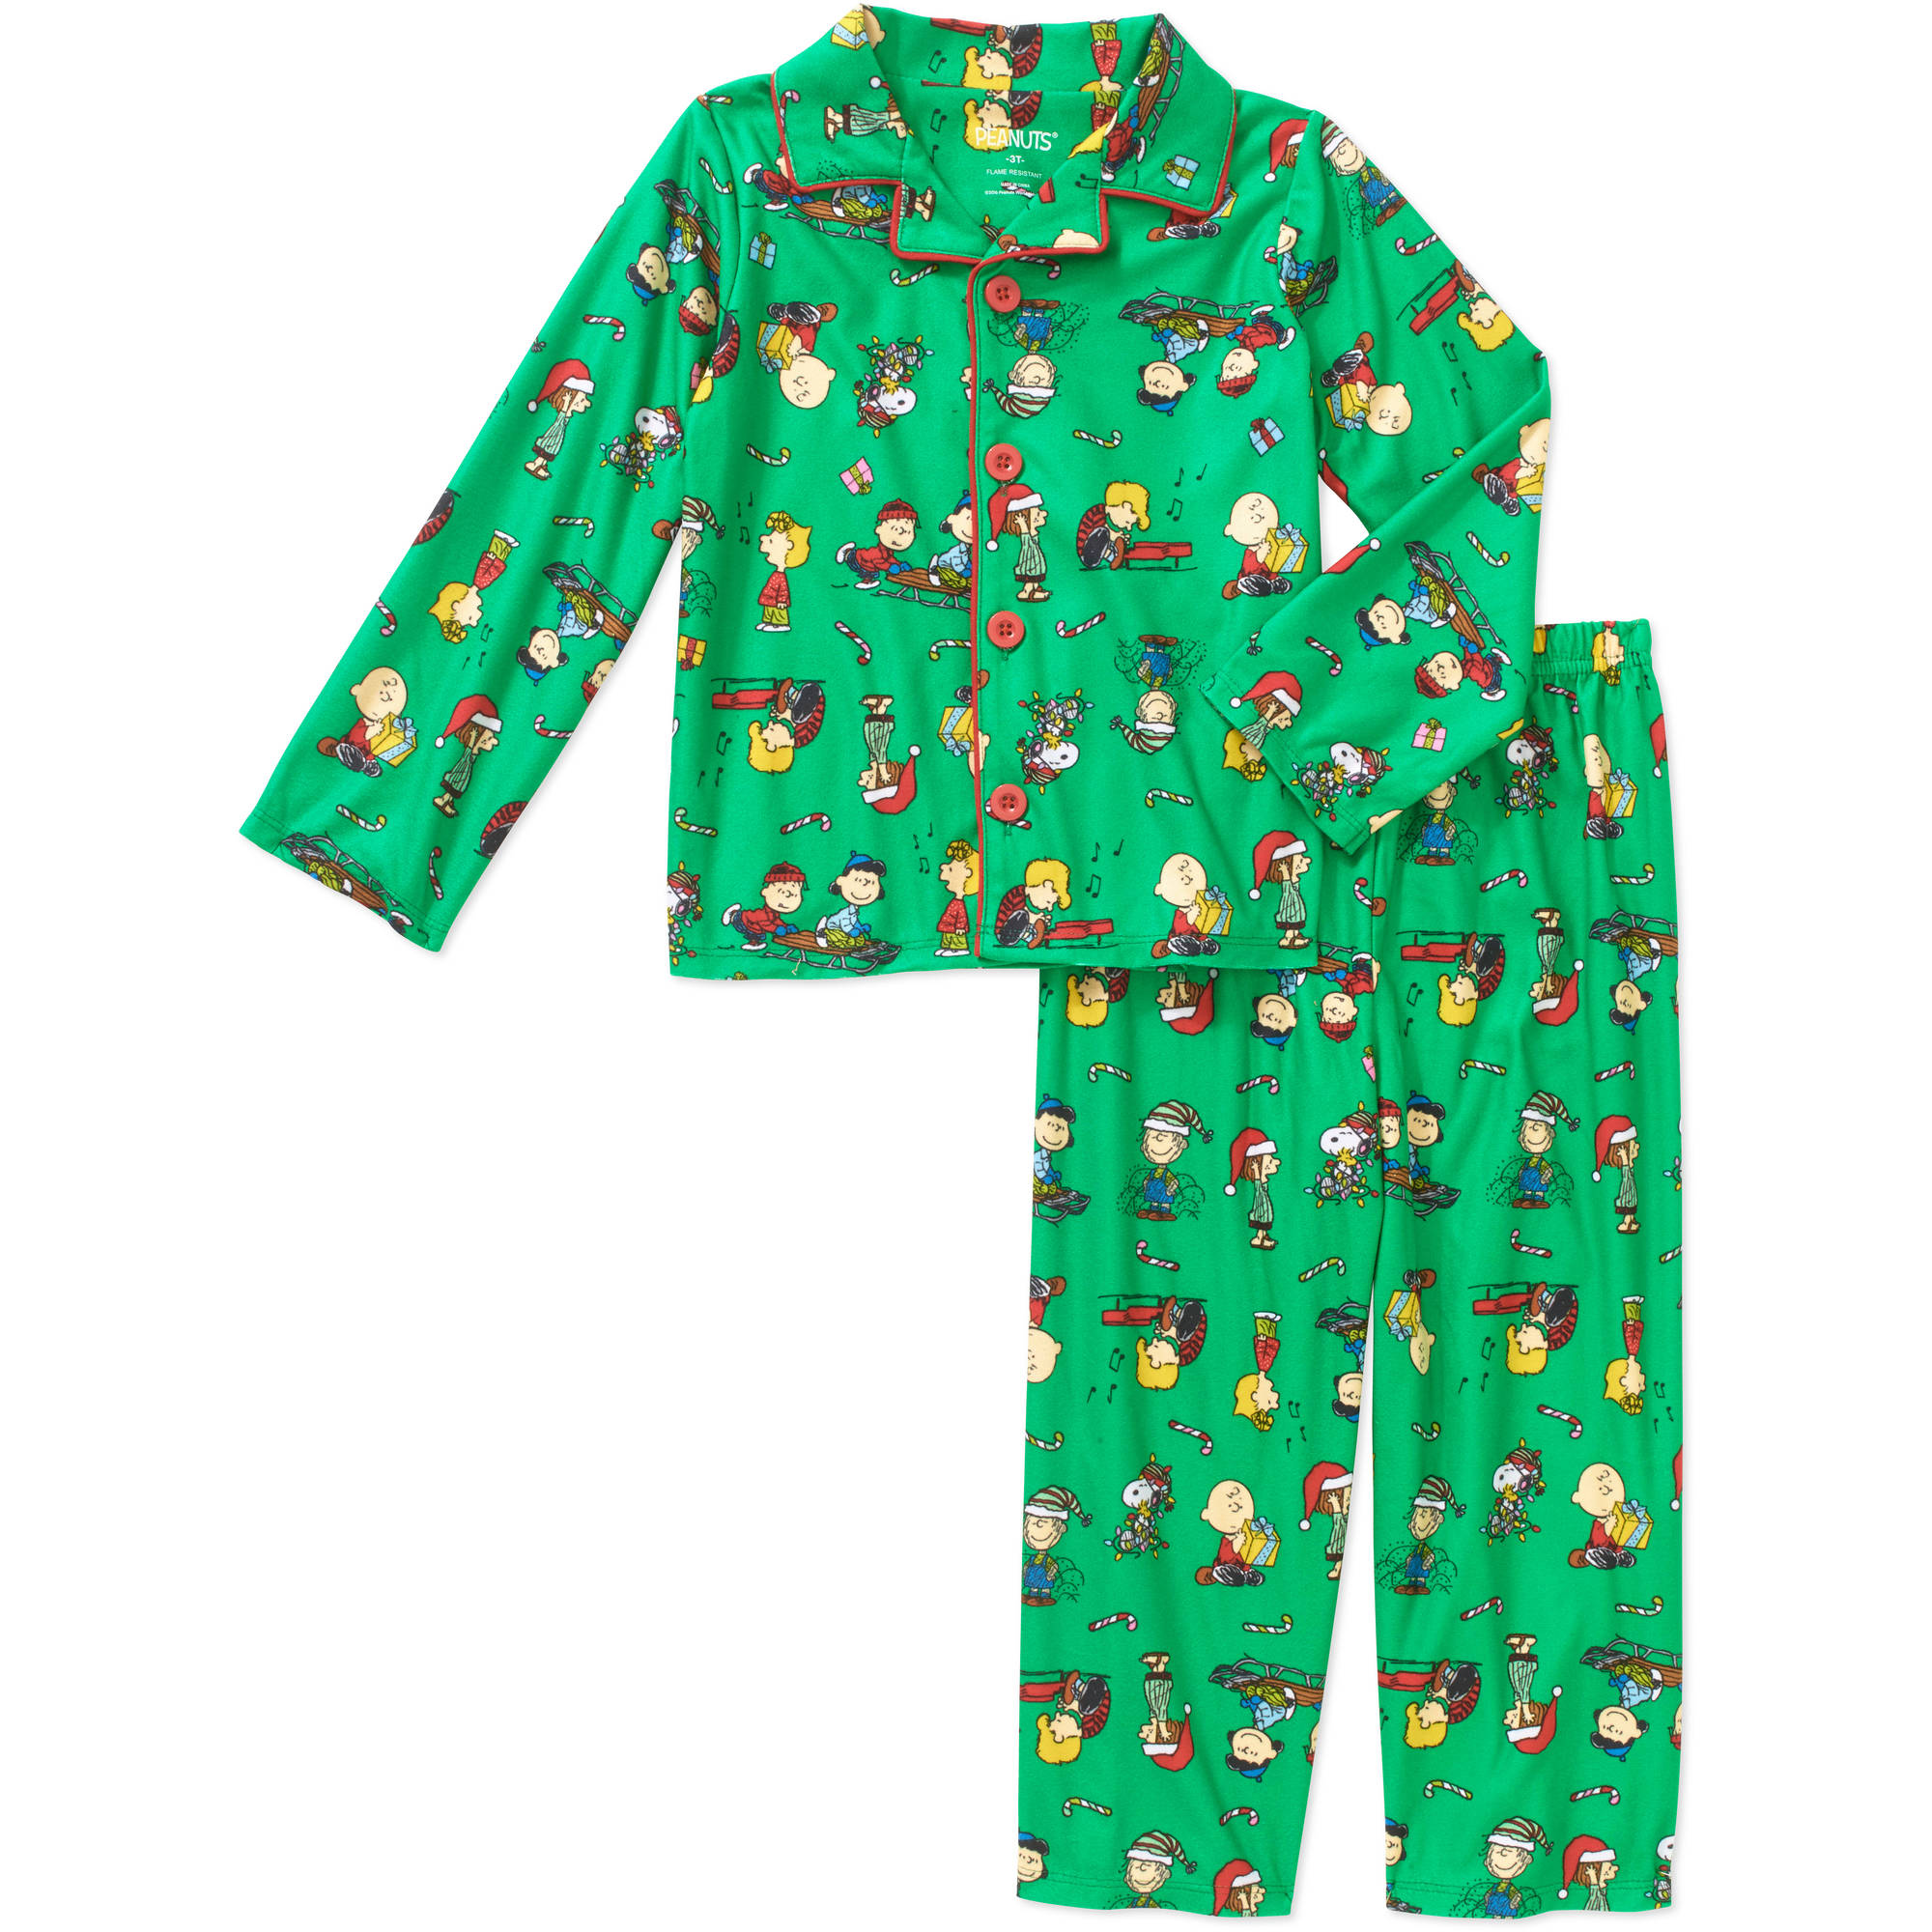 Peanuts Toddler Boys' Holiday Button Down Pajamas 2-Piece Set